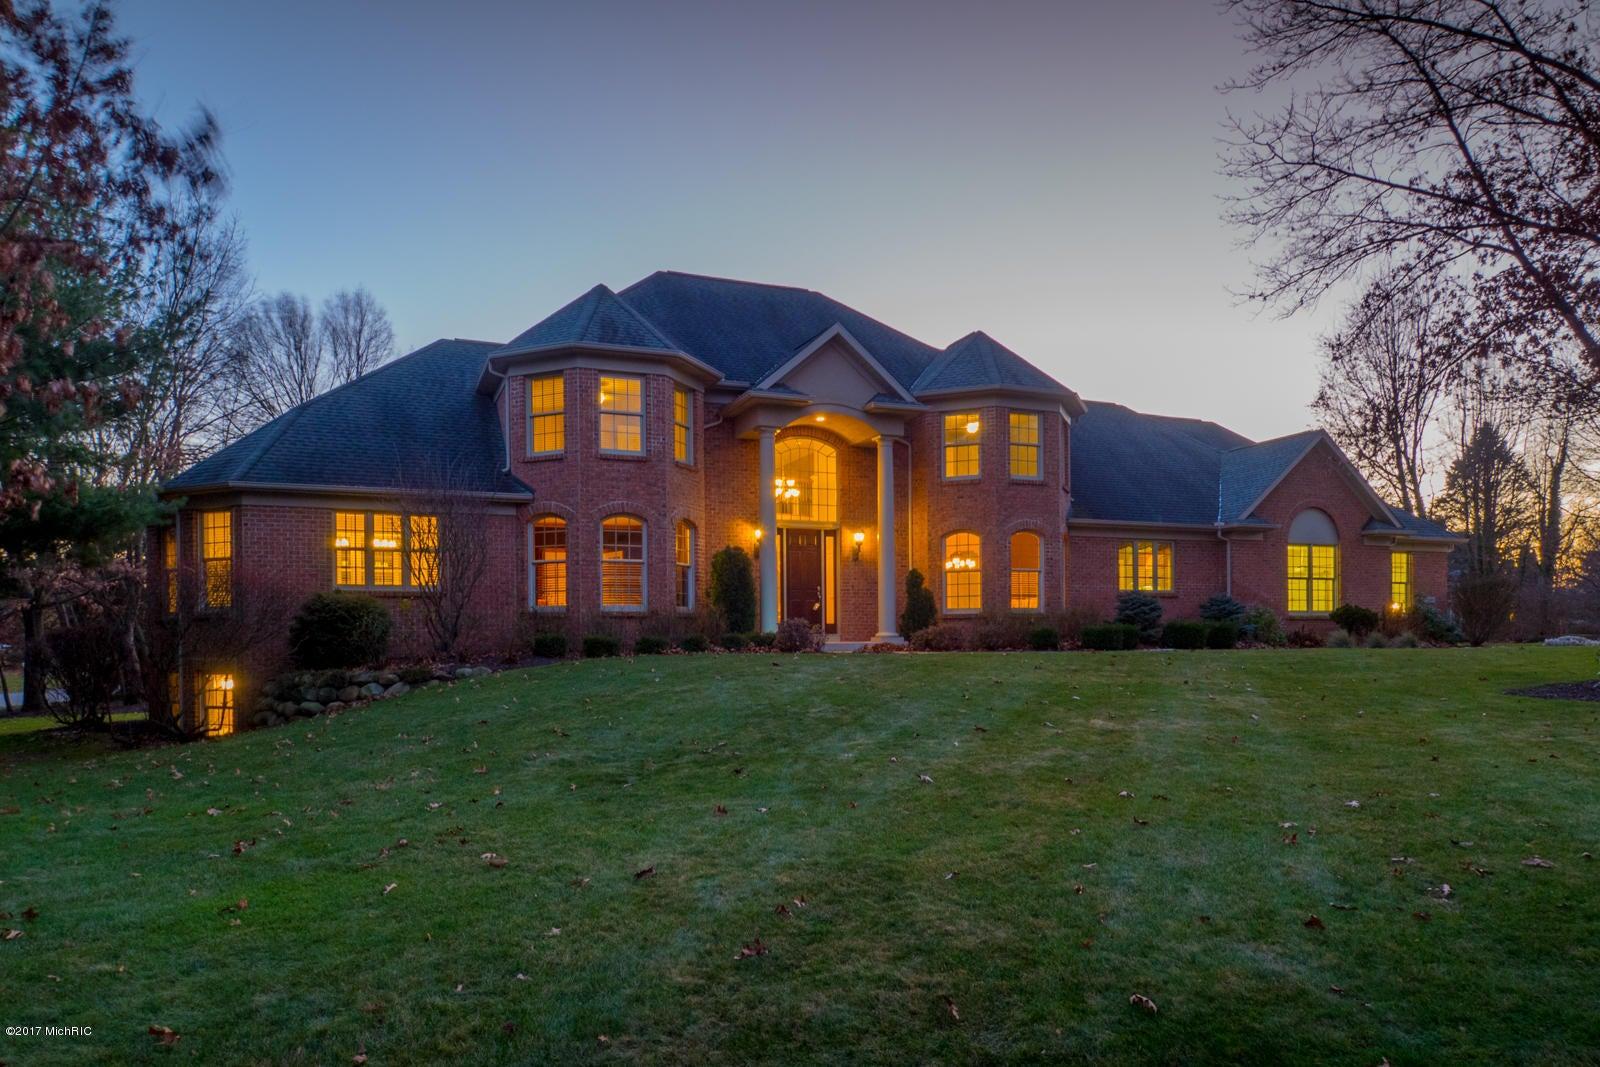 Single Family Home for Sale at 5605 Blue Jay 5605 Blue Jay Kalamazoo, Michigan 49009 United States